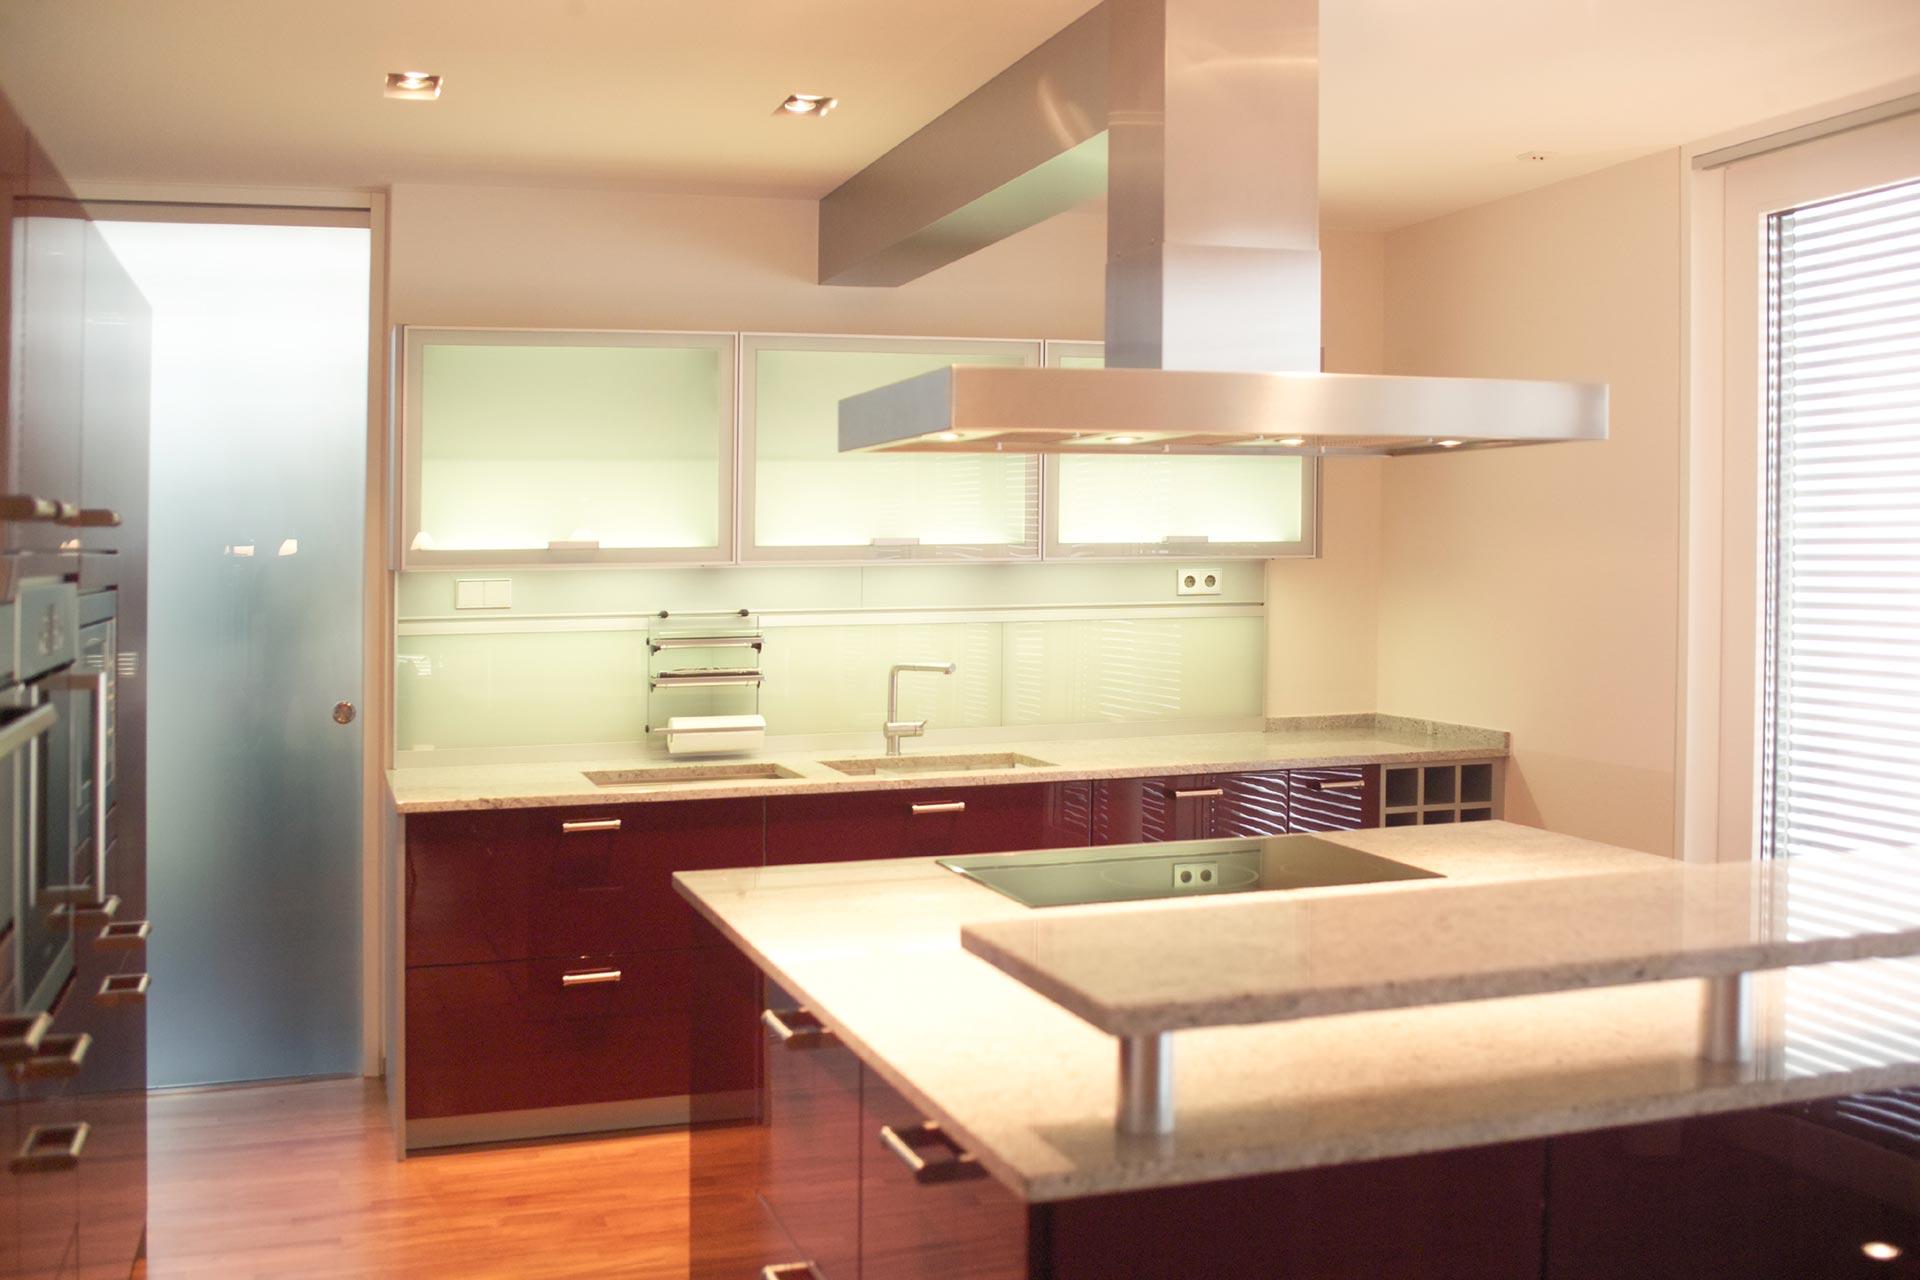 actica gmbh actica planen einrichten k che. Black Bedroom Furniture Sets. Home Design Ideas